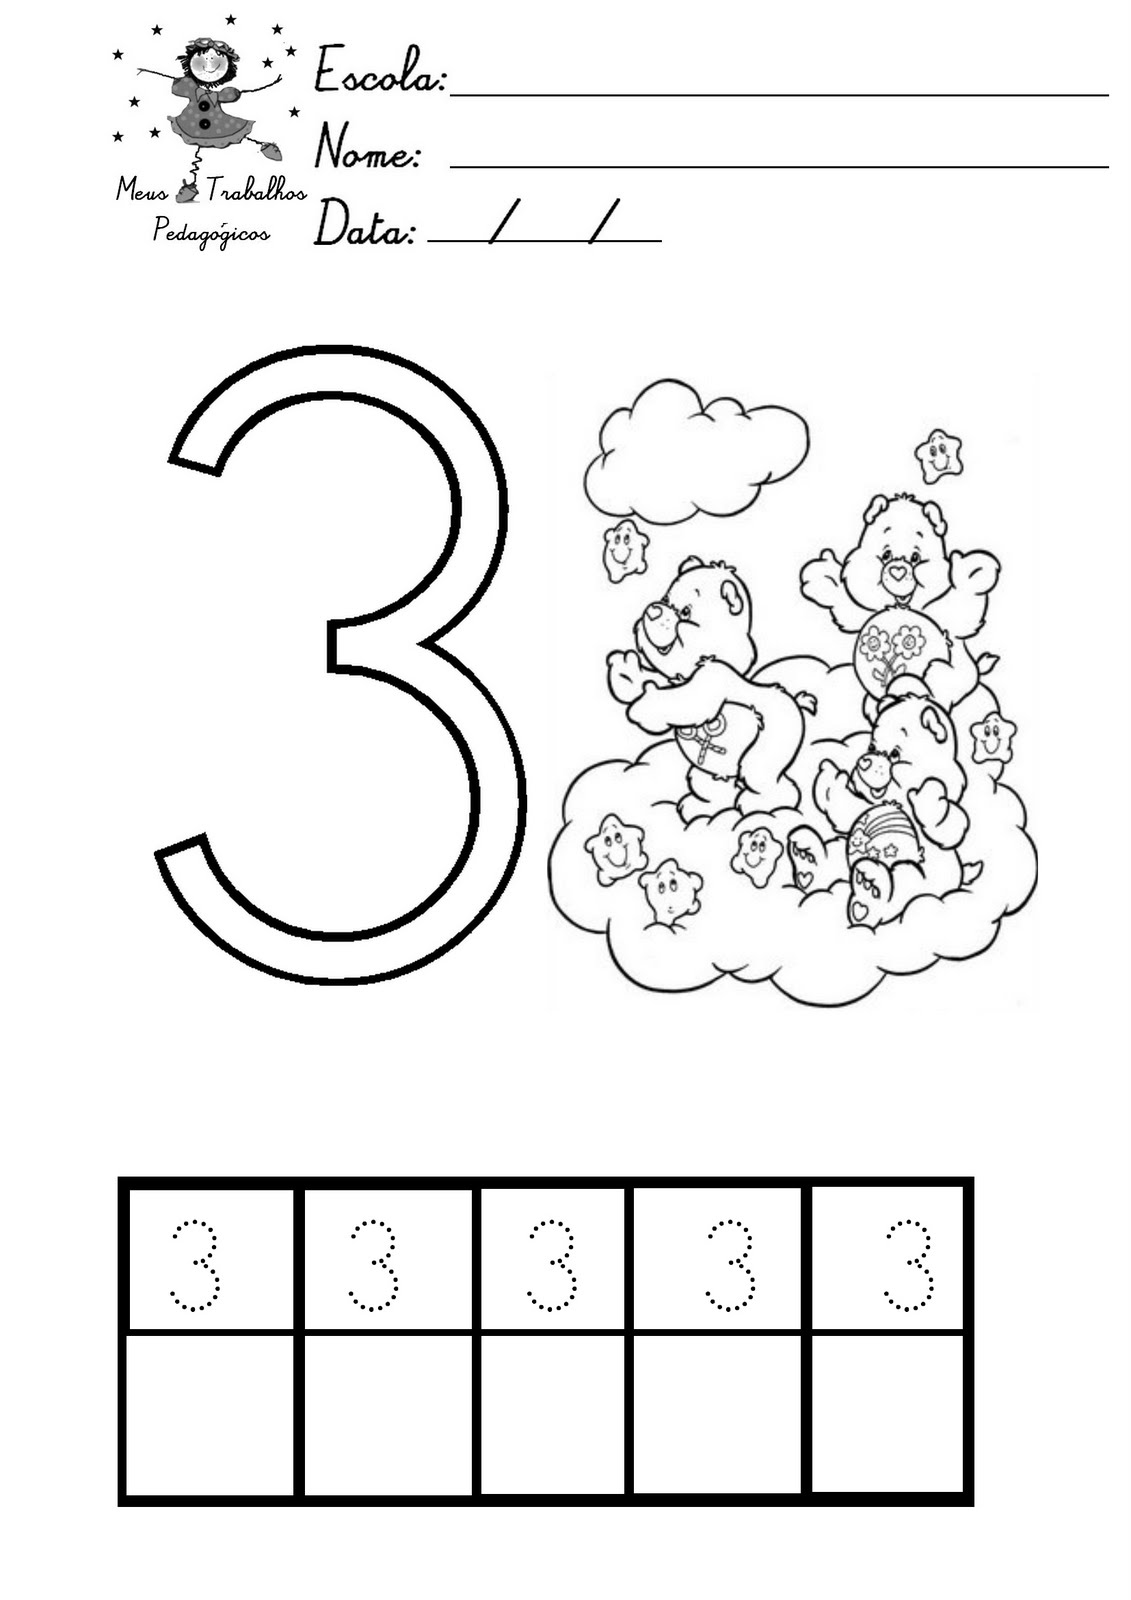 Meus Trabalhos Pedagógicos ®: Apostila Matemática